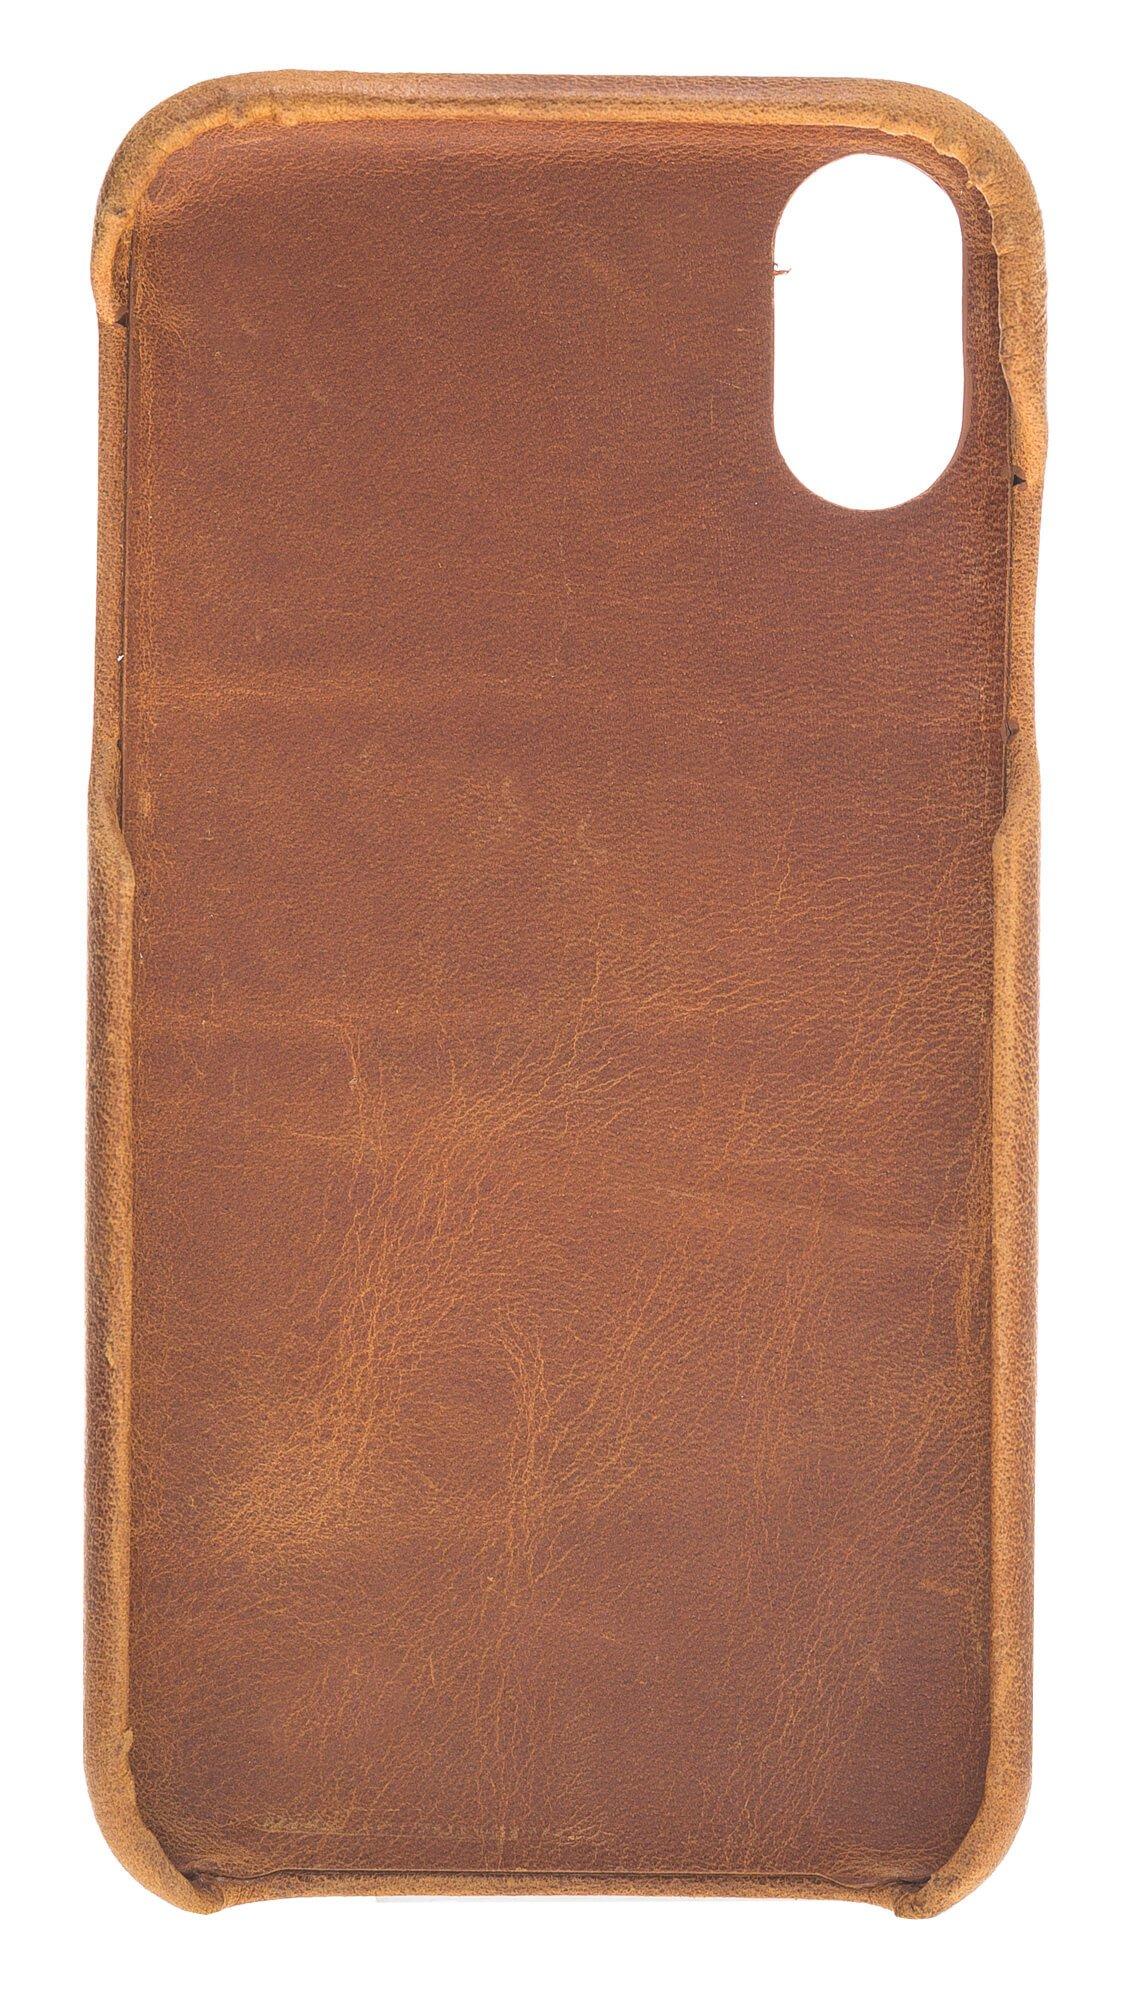 "iPhone XR 6.1 Zoll Abnehmbare Lederhülle ""Clemson"" in Camelbraun"